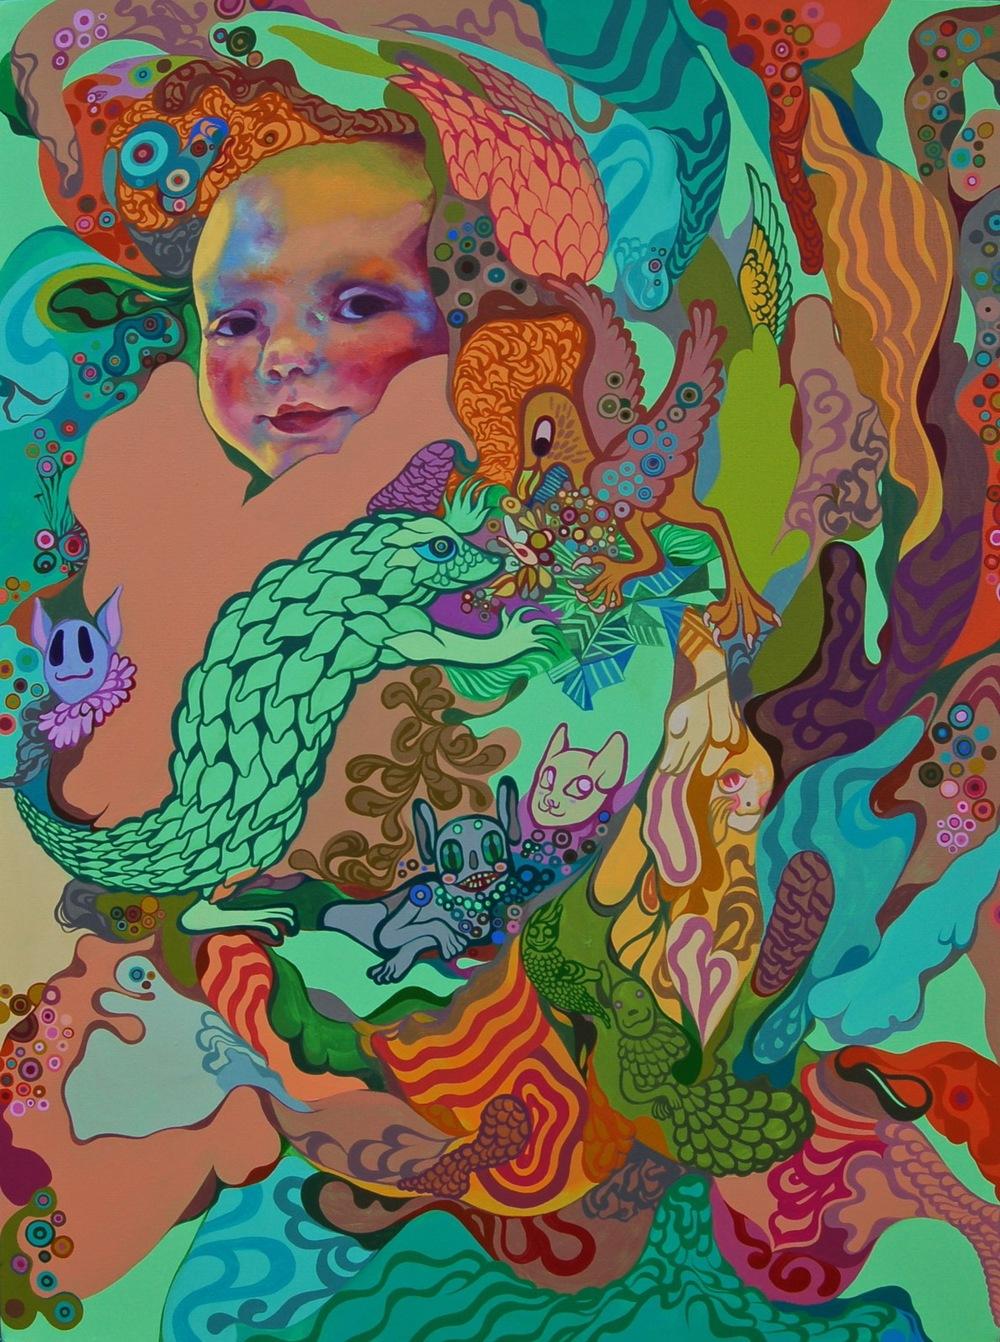 pshychedelic+baby+portrait+i+did.jpg